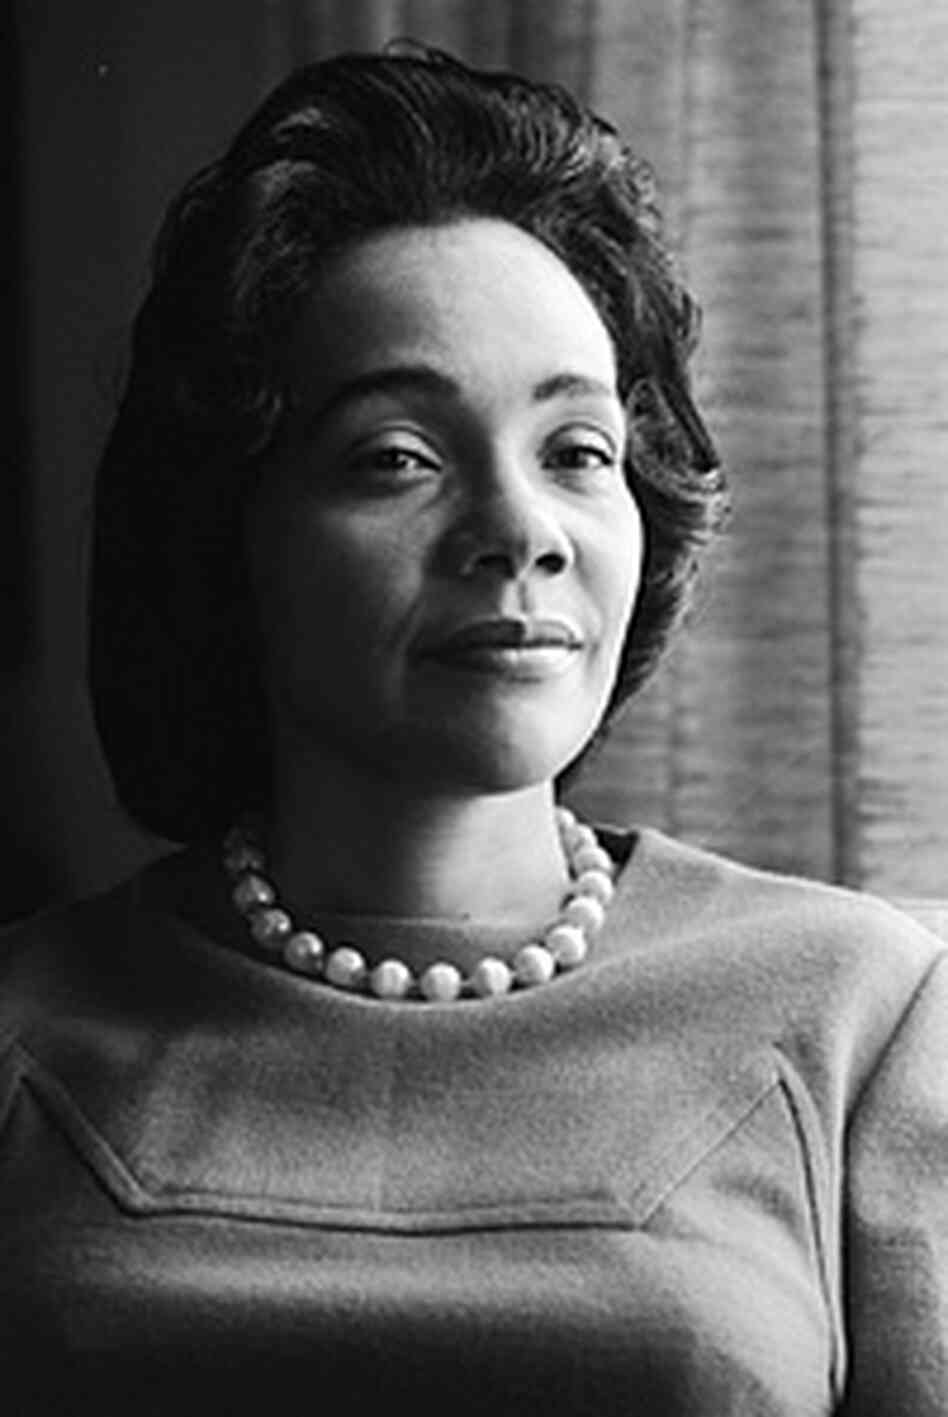 'I am not a symbol, I am an activist': the untold story of Coretta Scott King